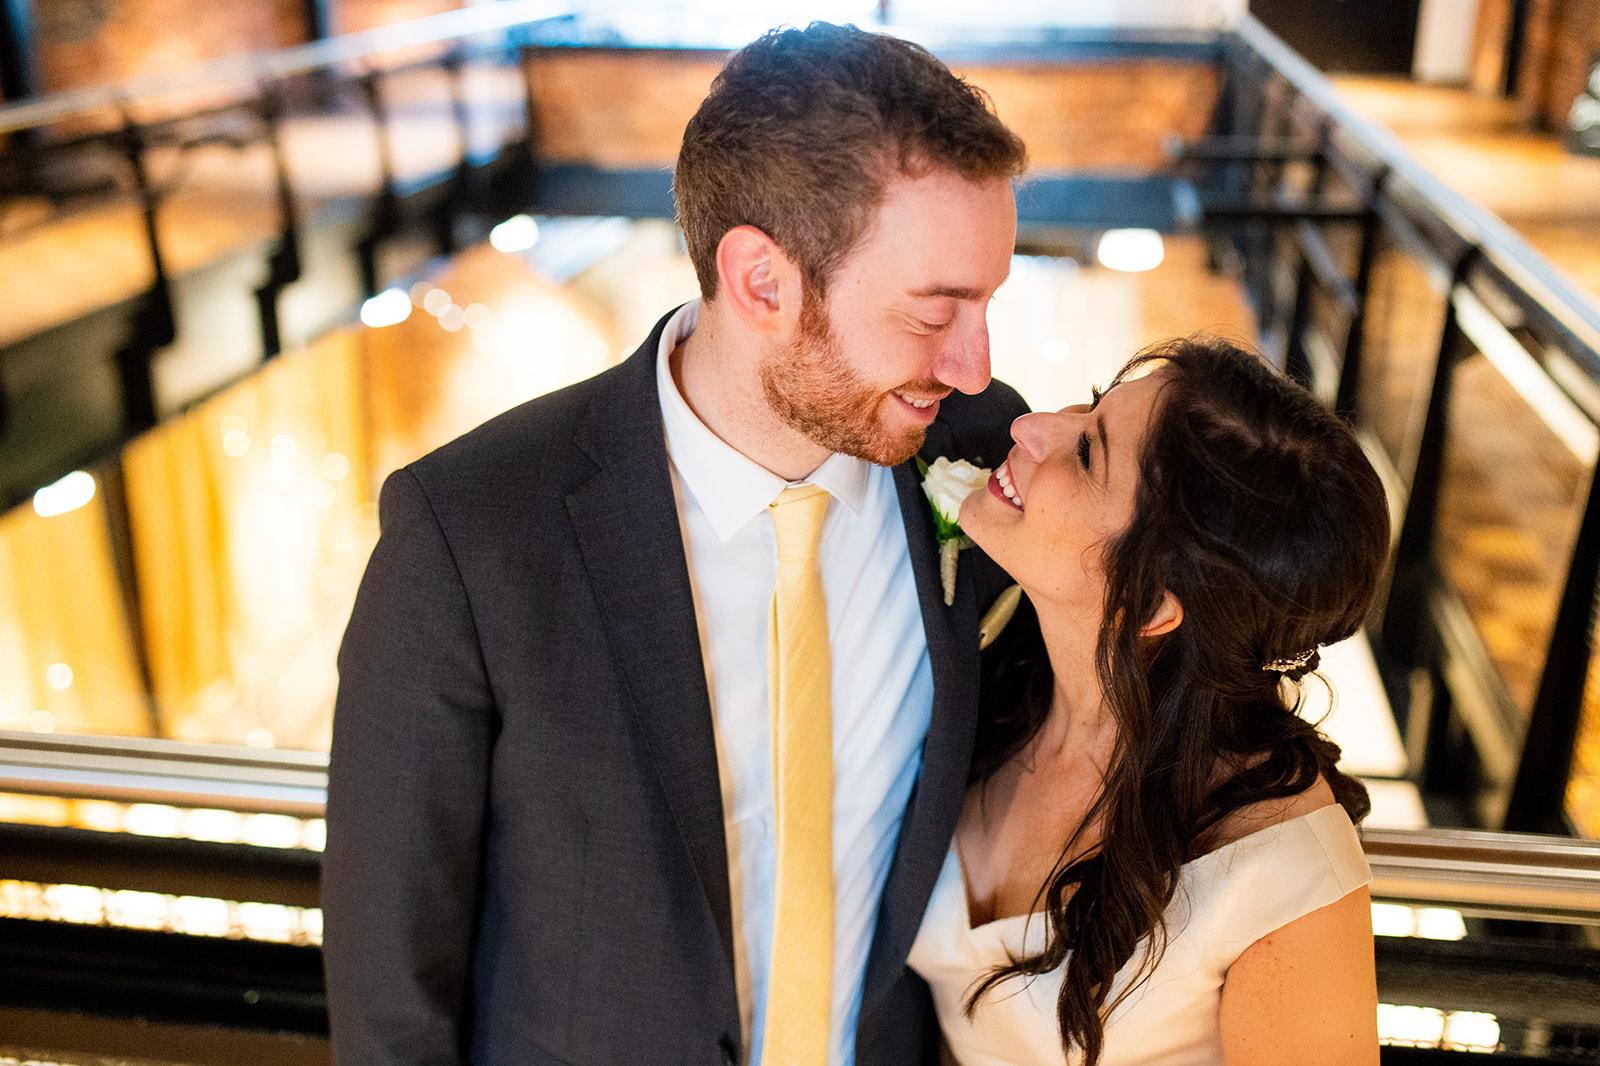 The_best_of_the_best_wedding_photographer_Mantas_Kubilinskas-288.jpg